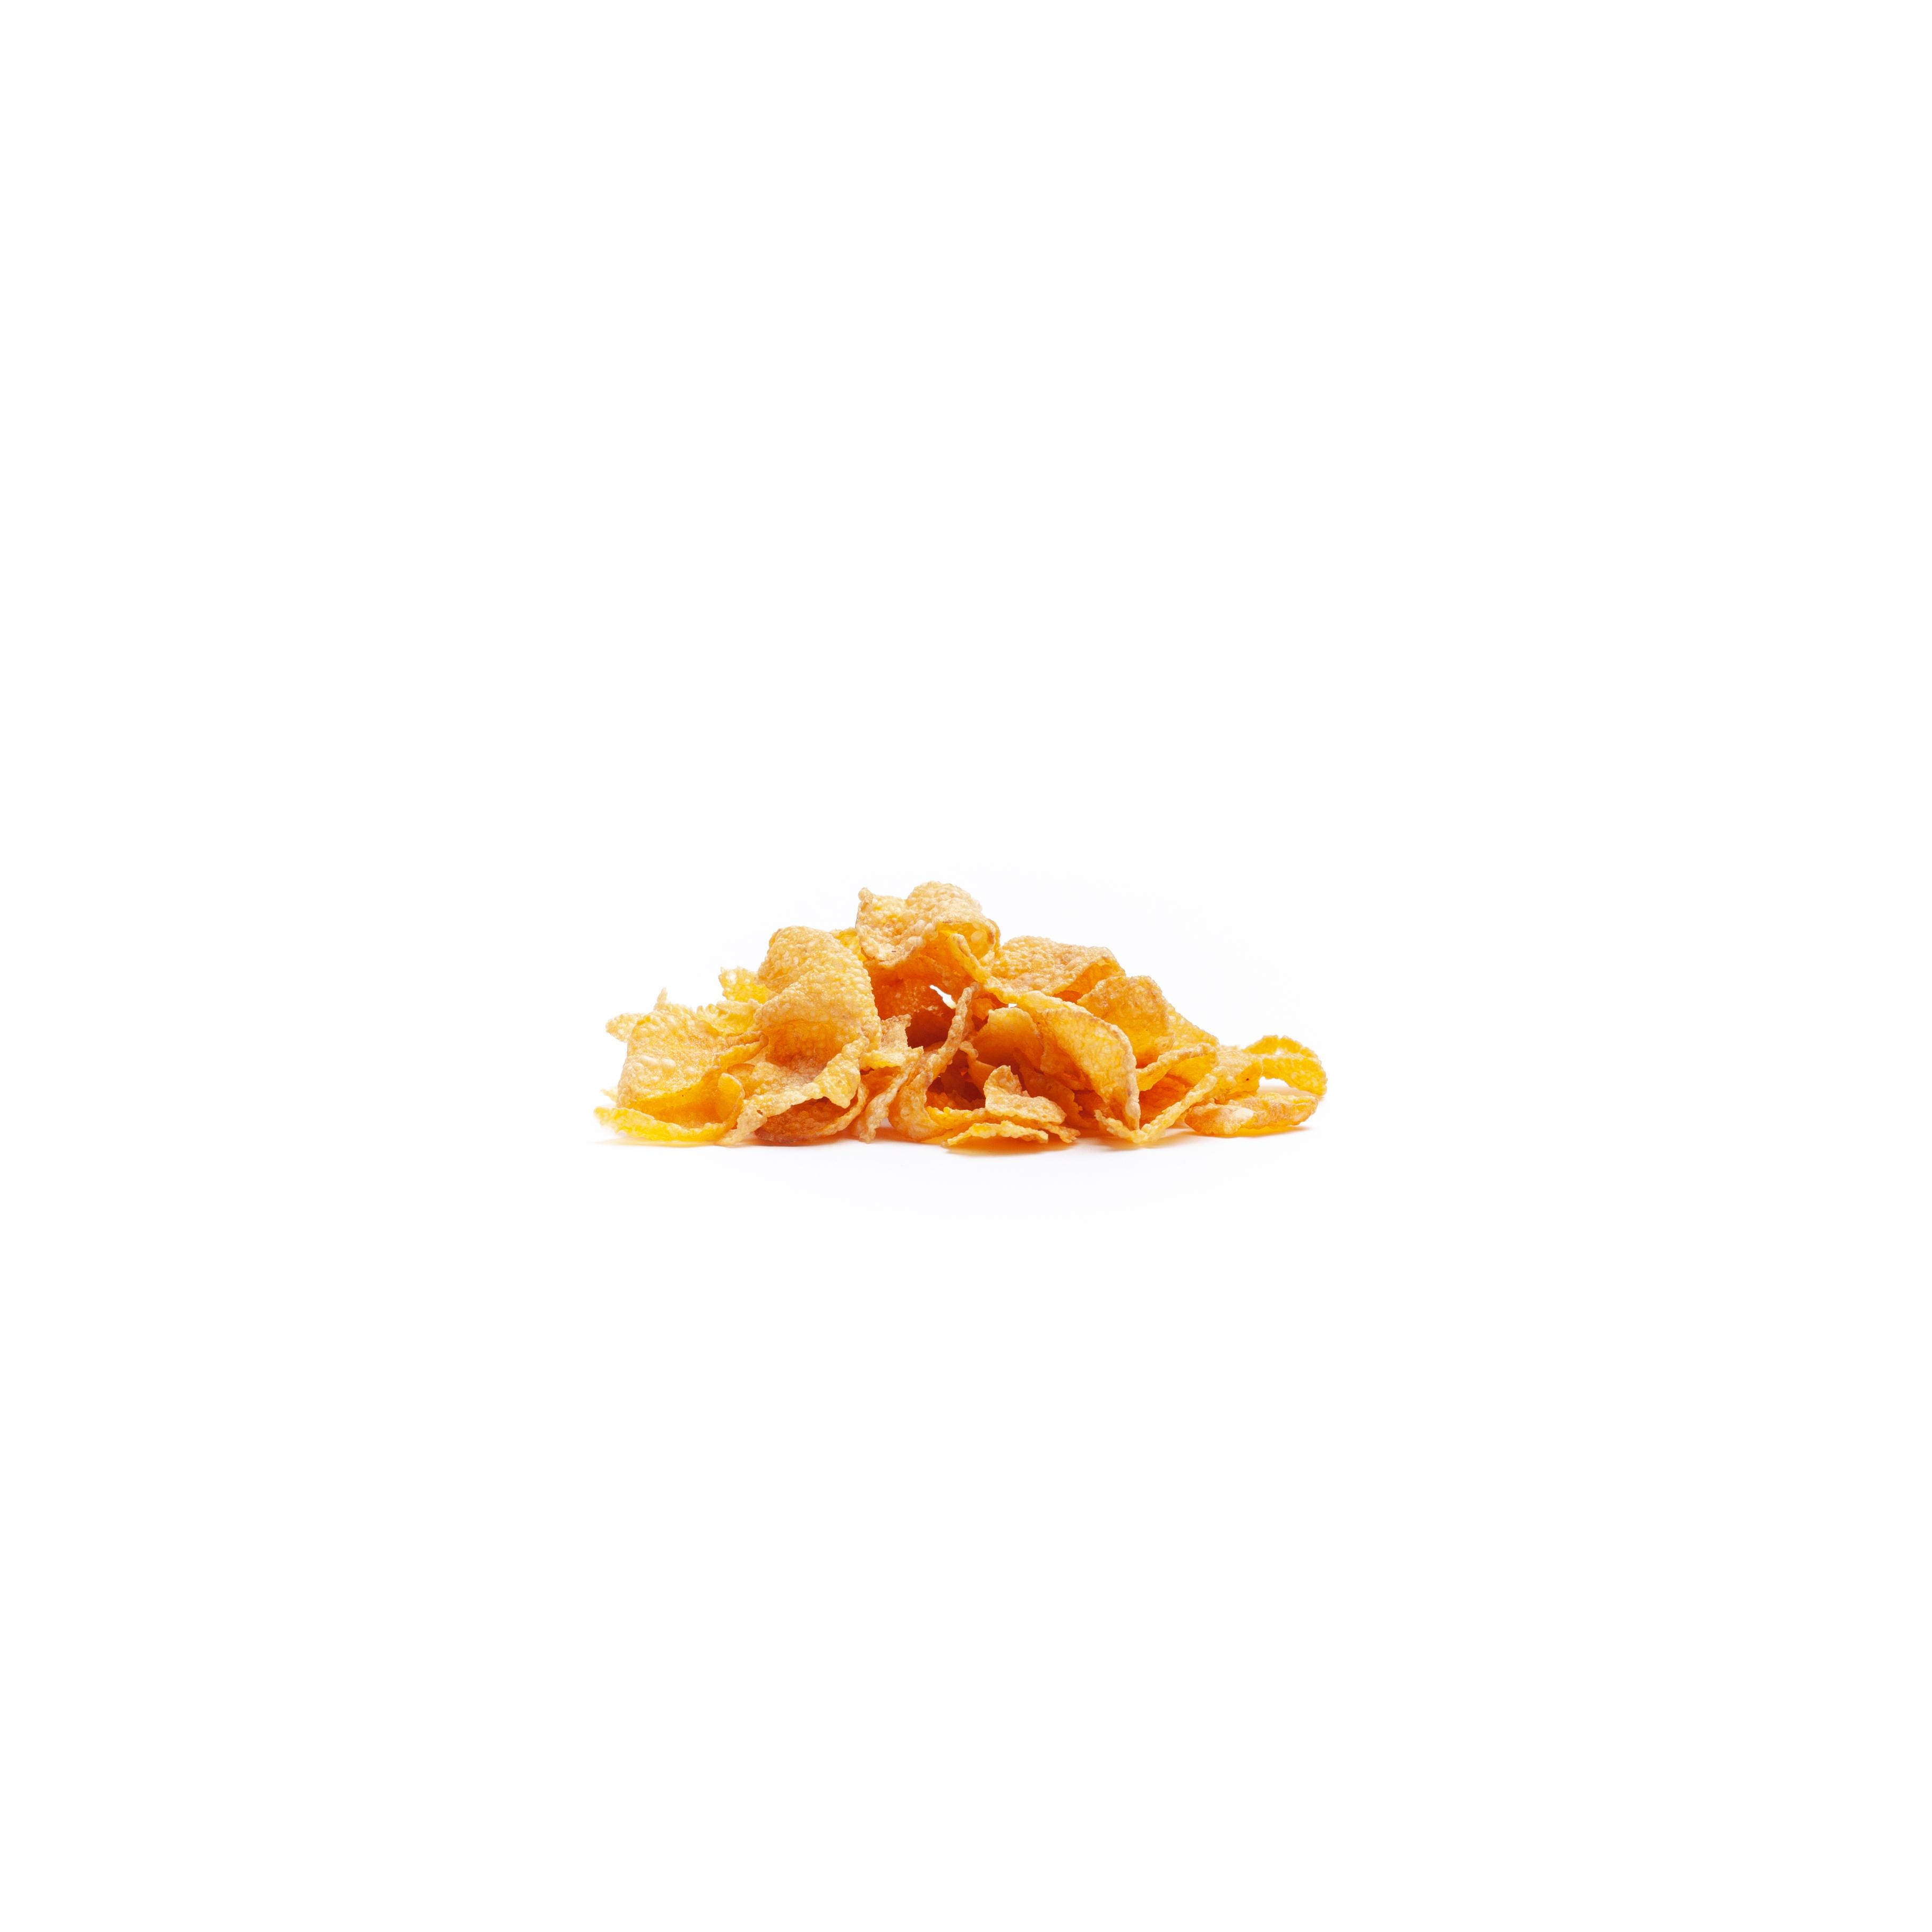 Cornflakes | Kellogg's